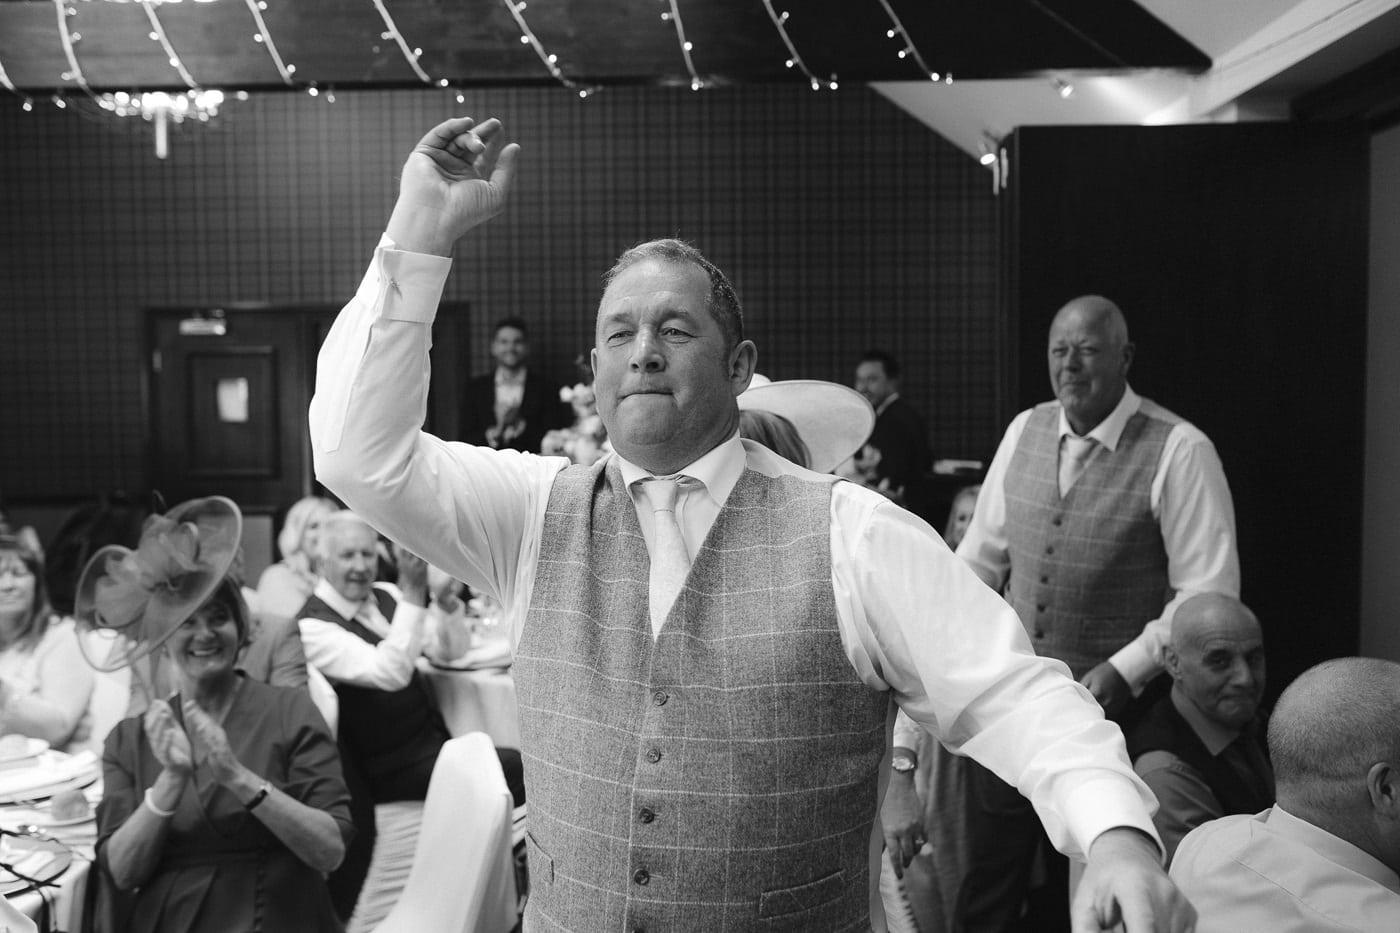 Man in Suit at Wedding Reception at Irton Hall Cumbria